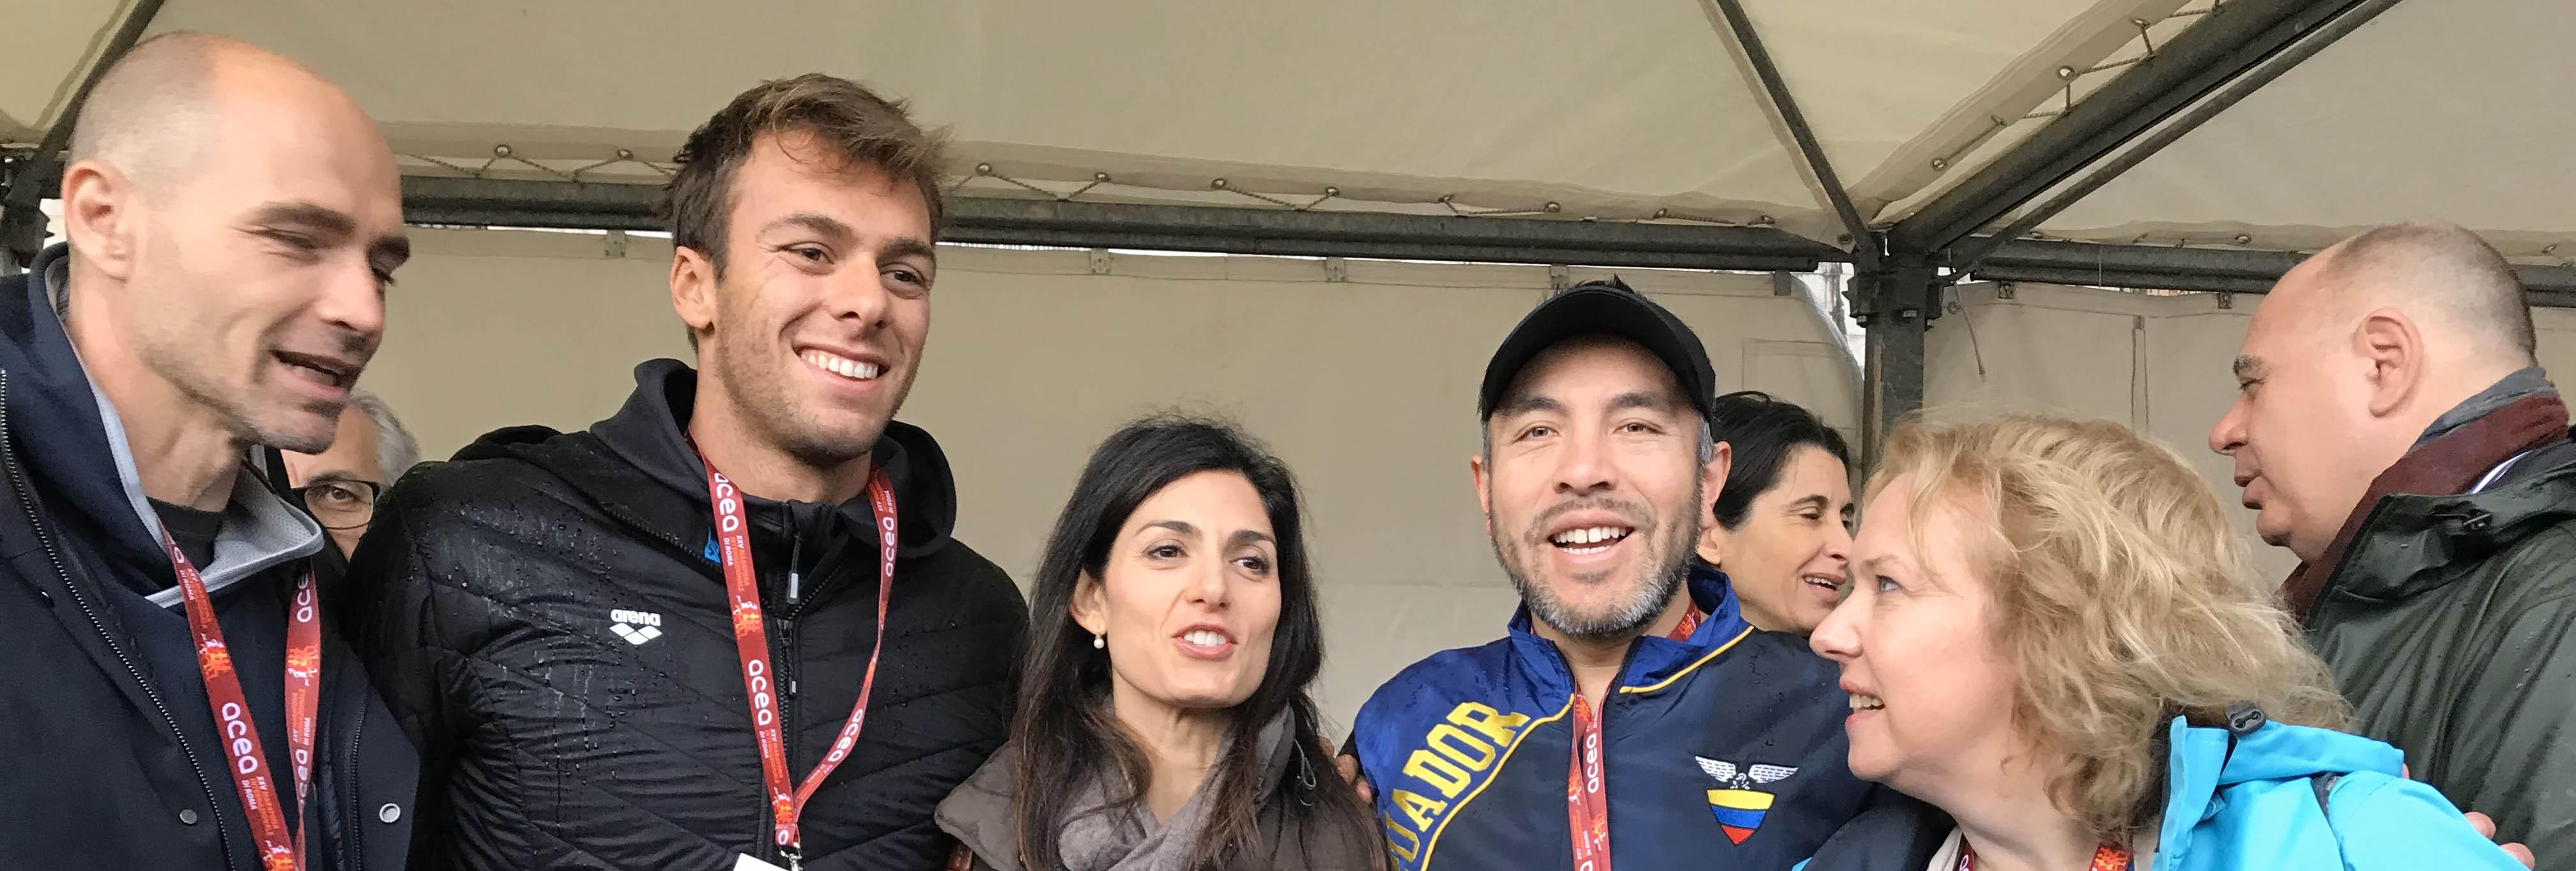 L'Ecuador presente alla Acea Run Rome The Marathon